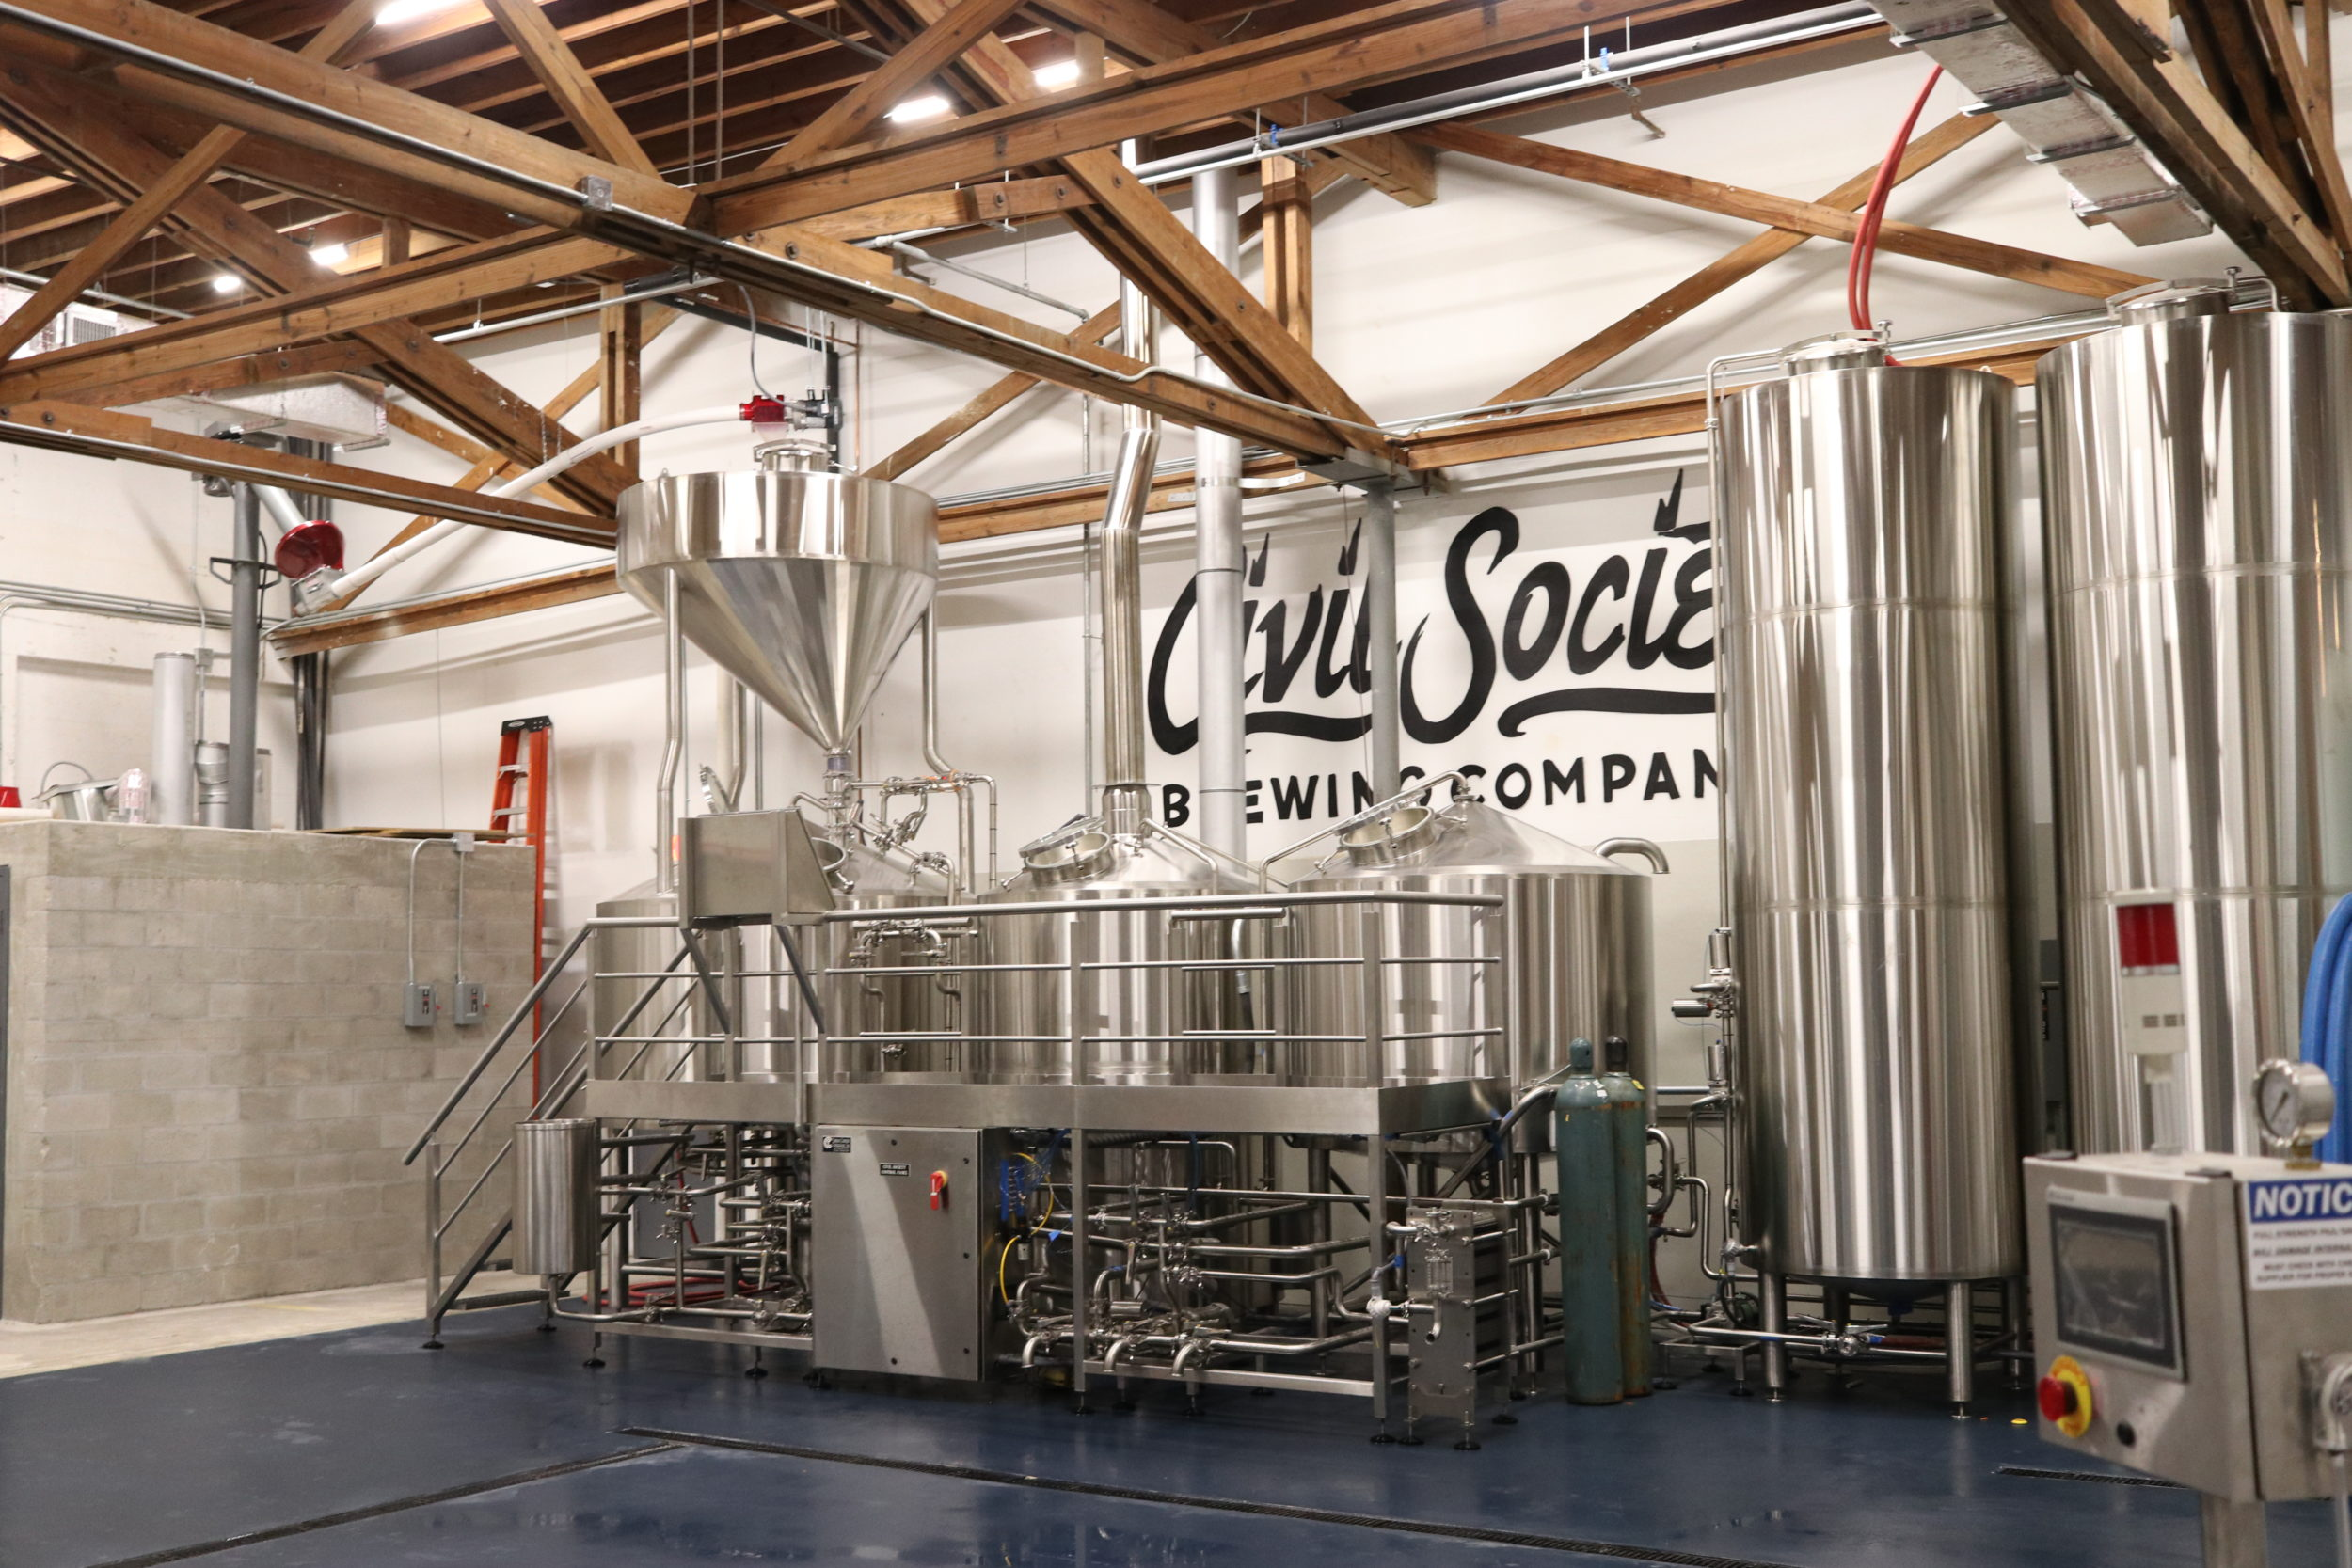 Civil Society Brewery